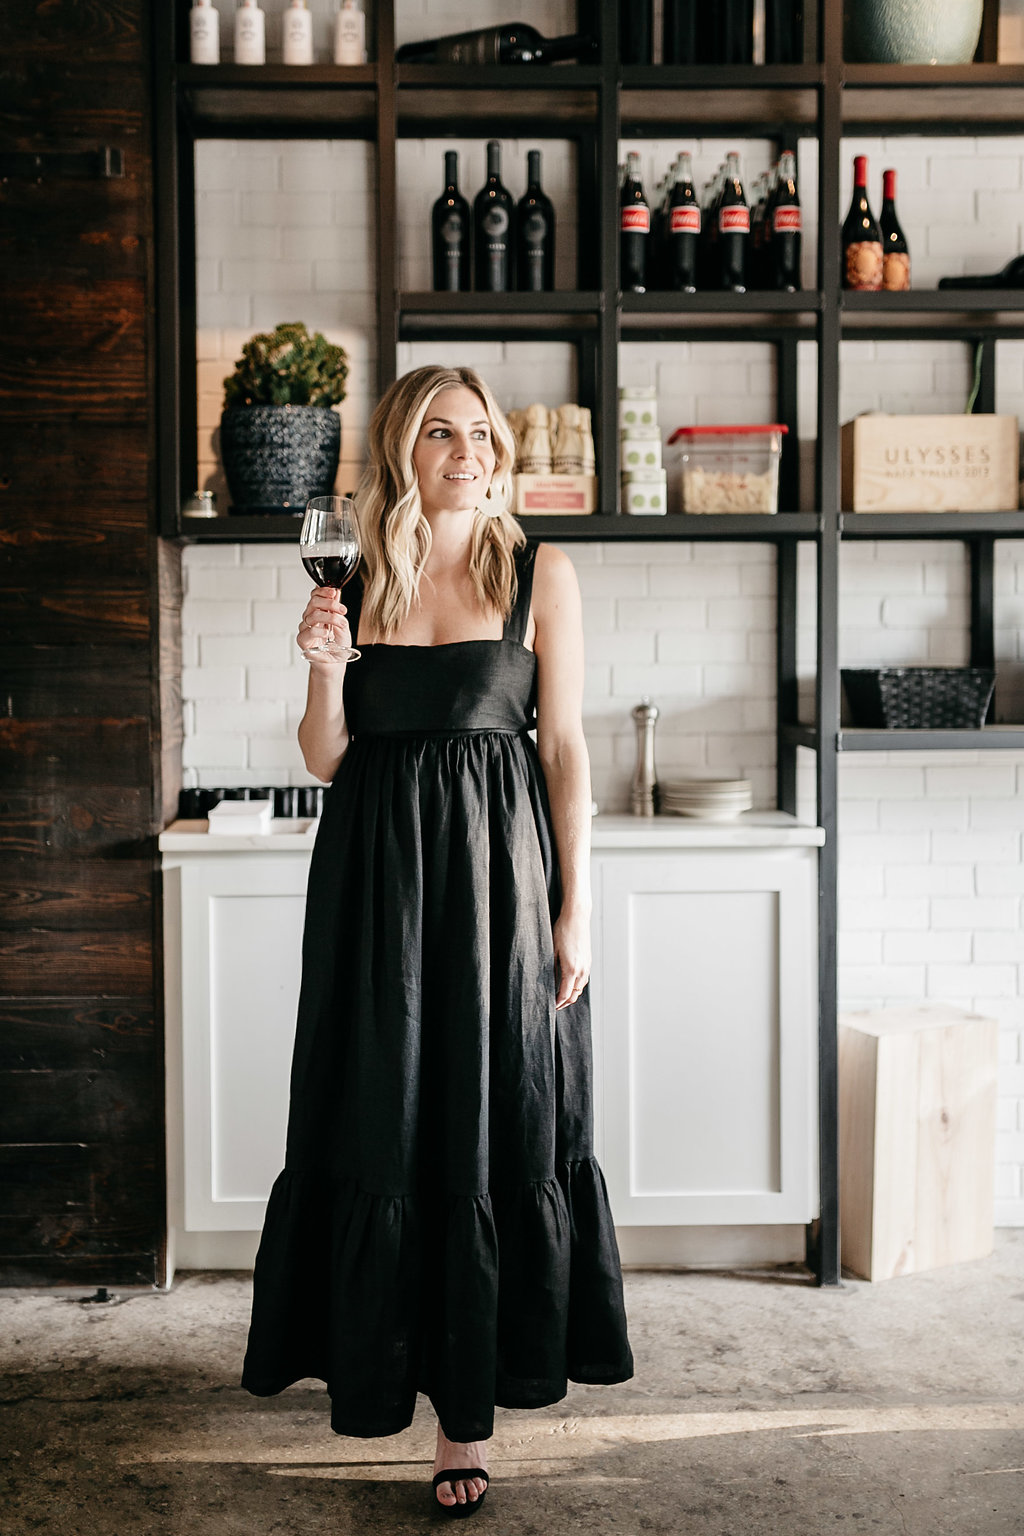 Black dress plus a list of the best restaurants in Dallas